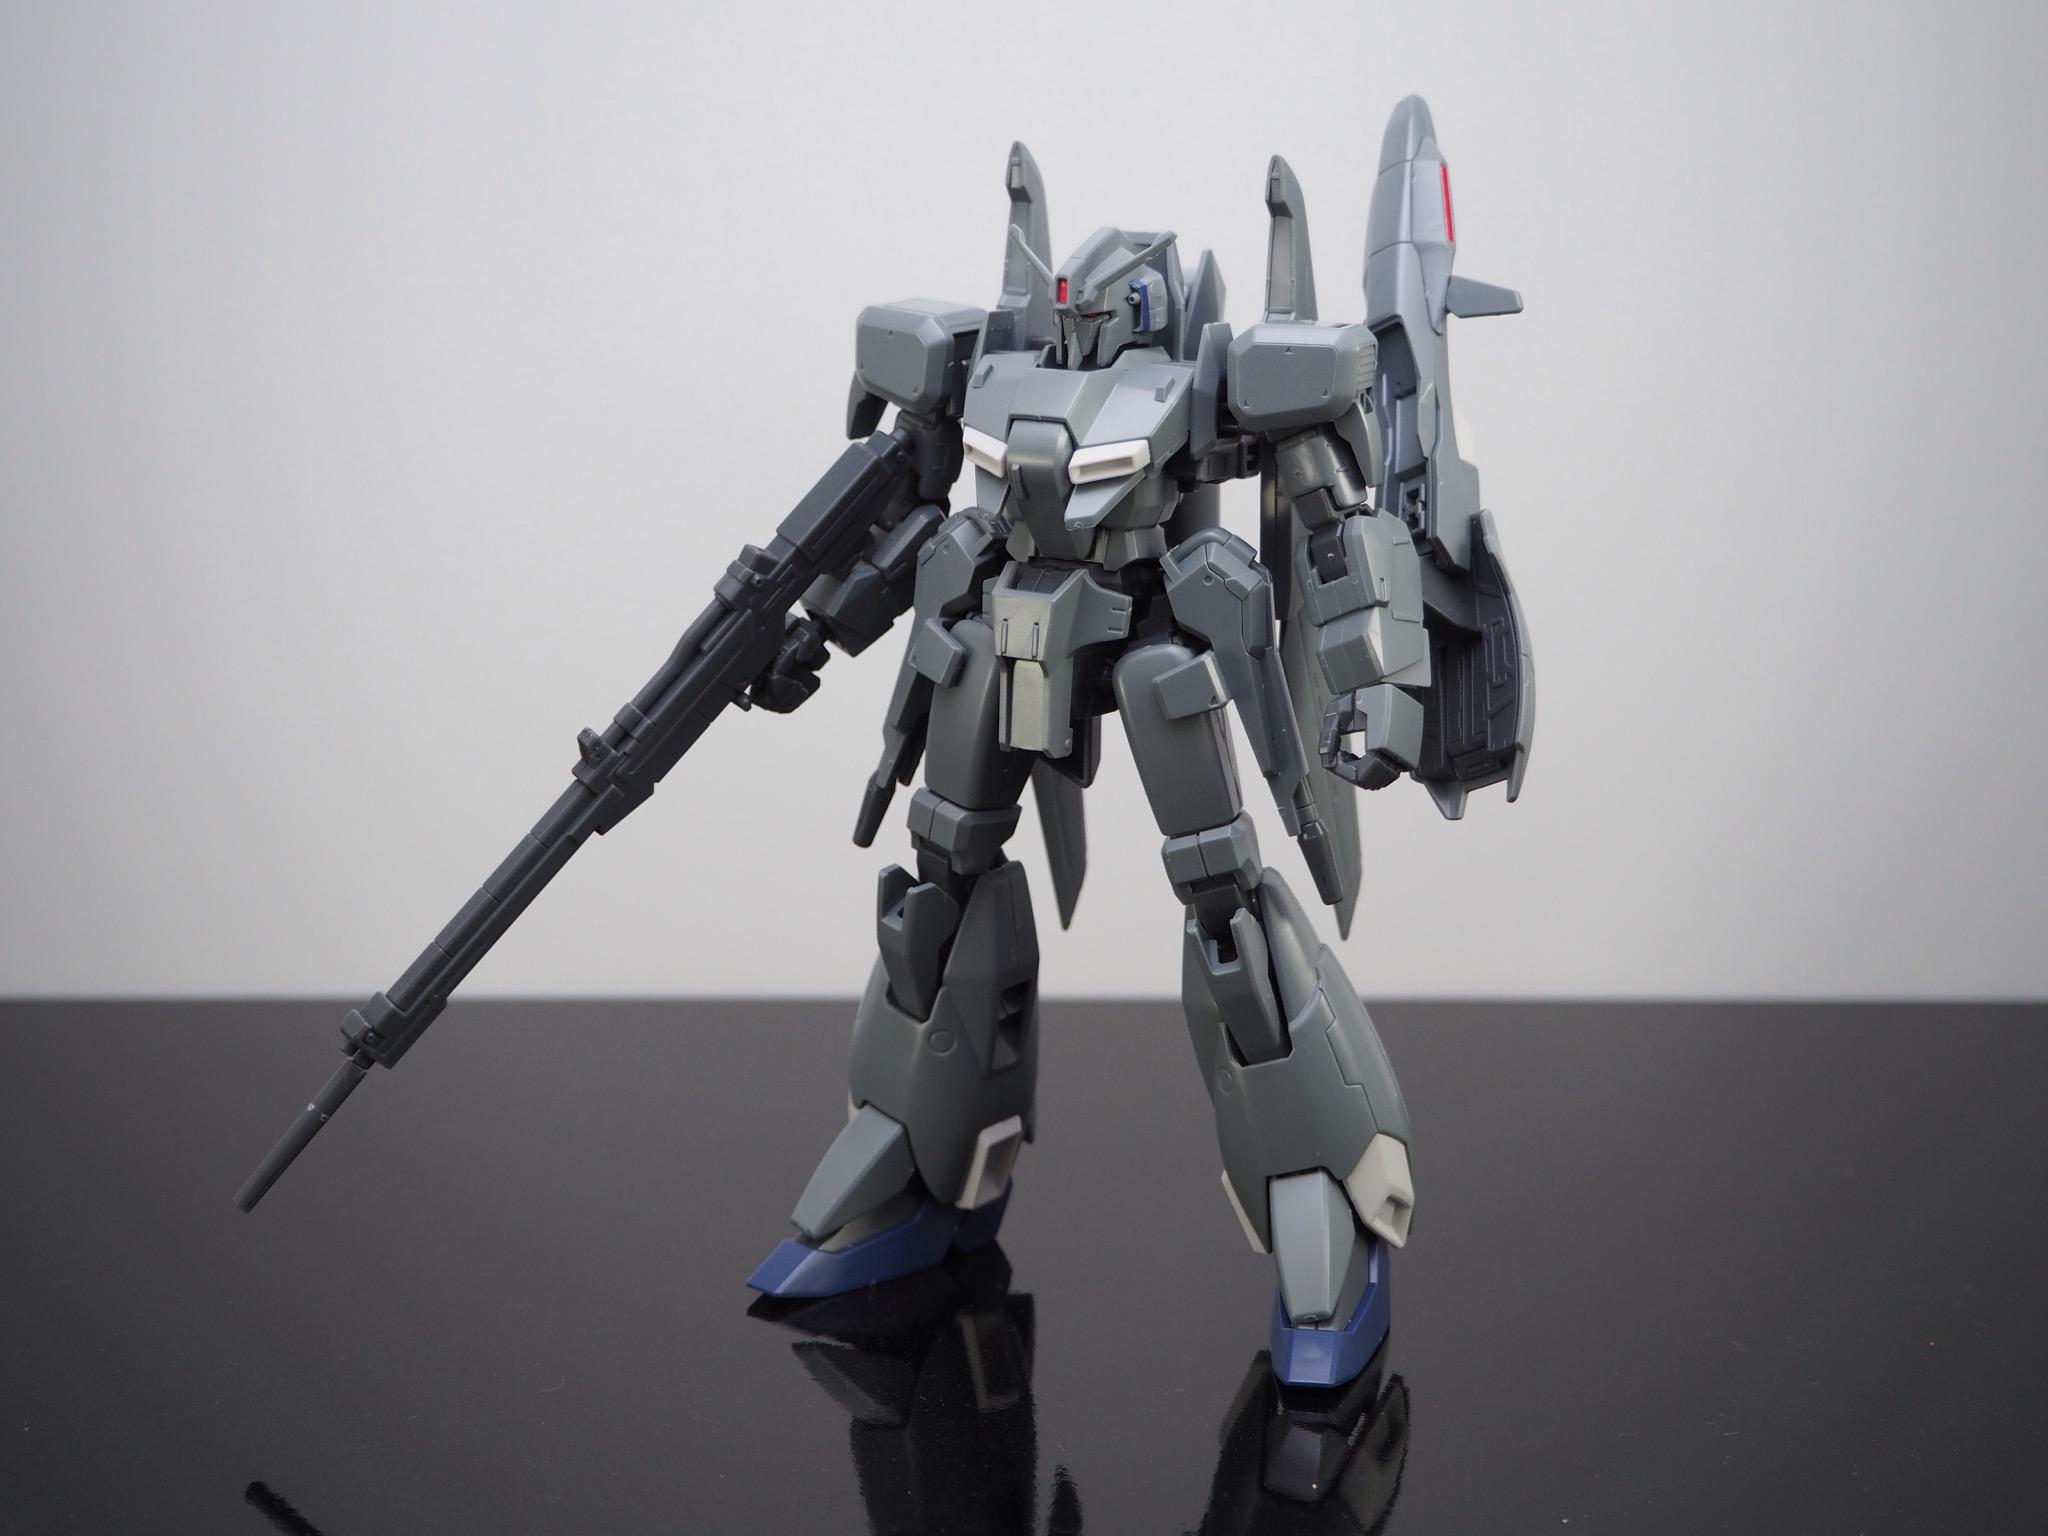 HGUC 1/144 MSZ-006A1 ゼータプラス(ユニコーンVer.)